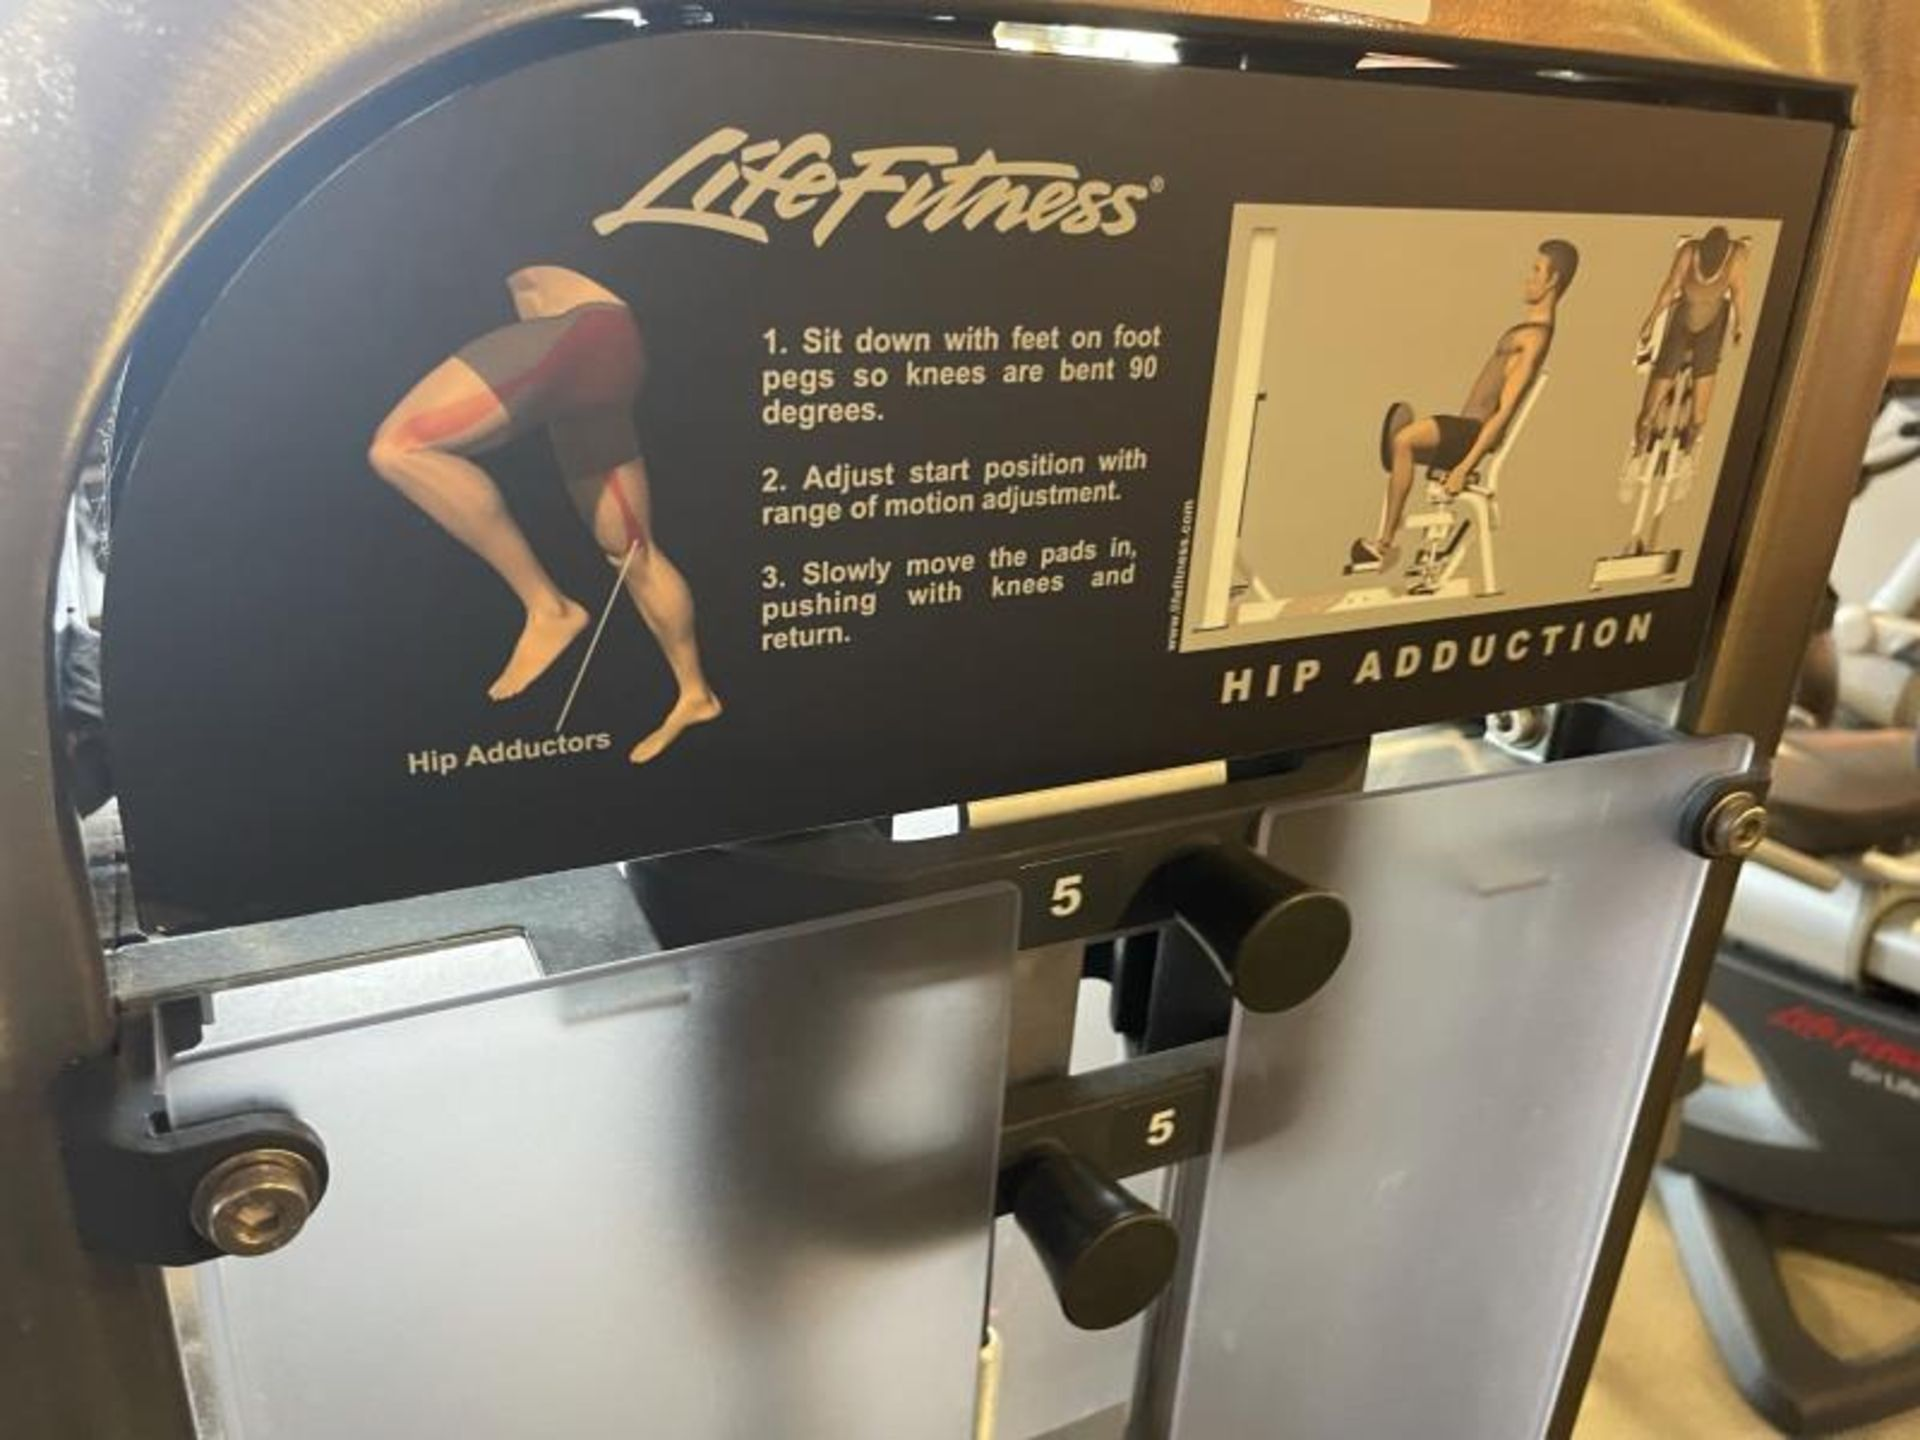 Life Fitness Hip Adduction M: PSHADSE - Image 5 of 5